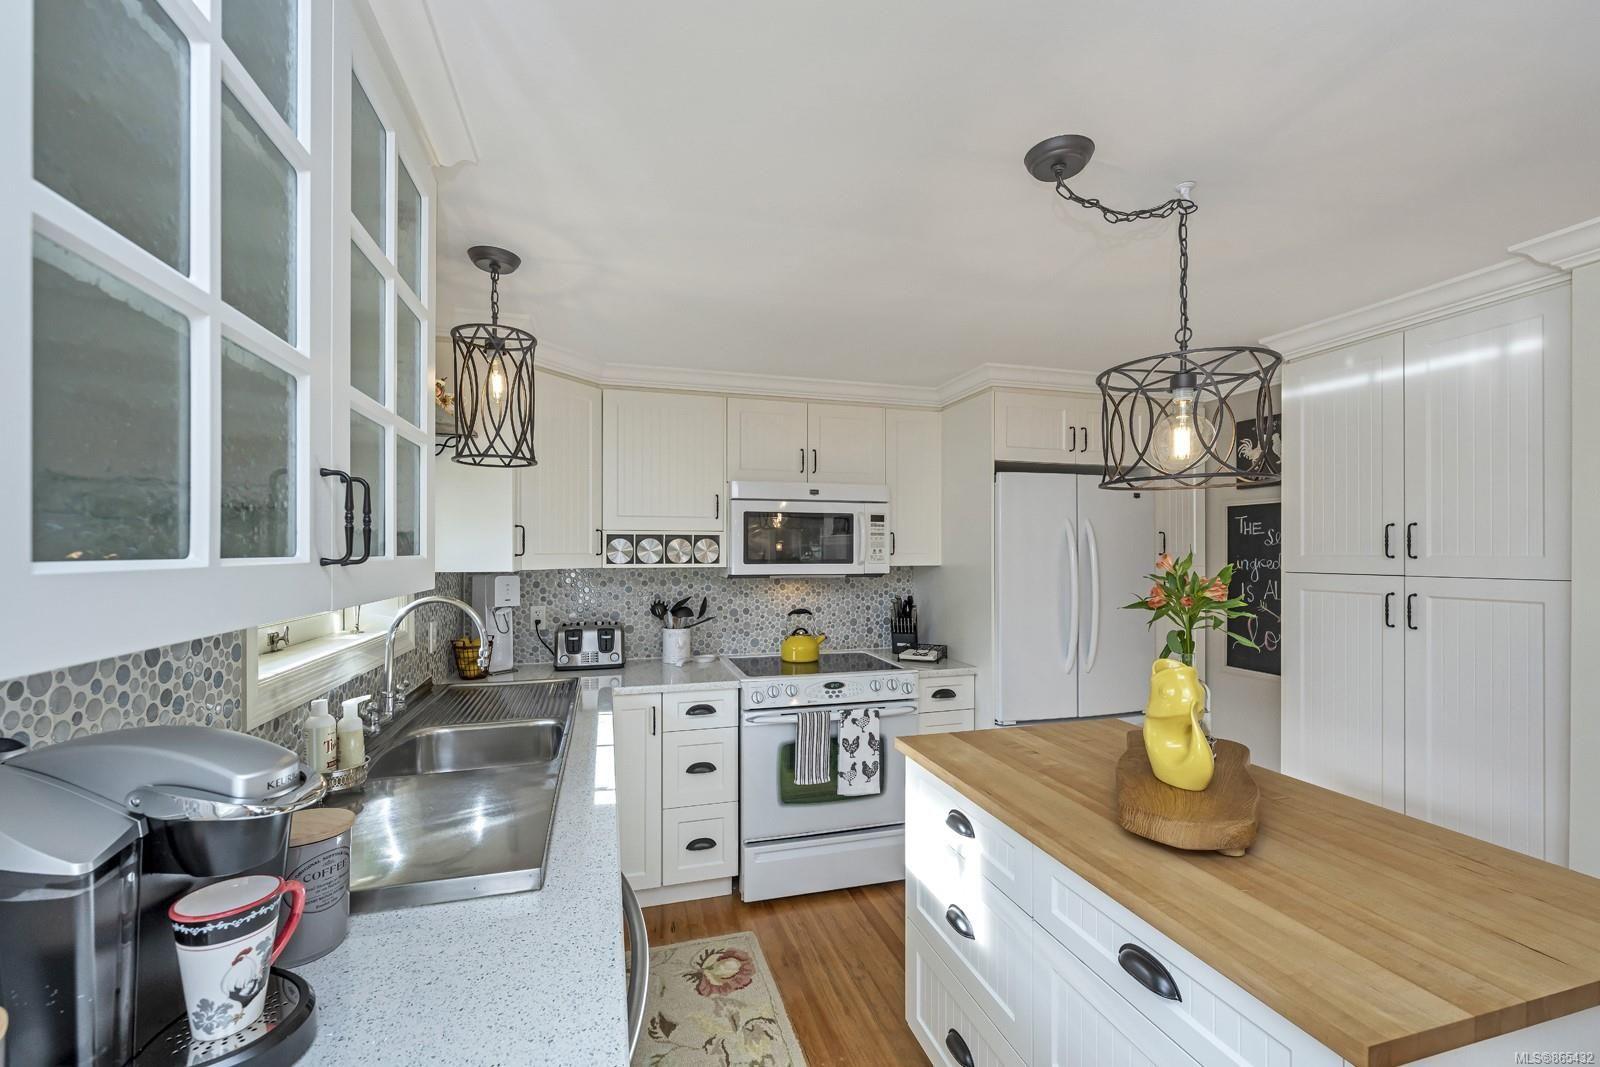 Photo 8: Photos: 6734 Drummond Dr in : Du East Duncan House for sale (Duncan)  : MLS®# 865432